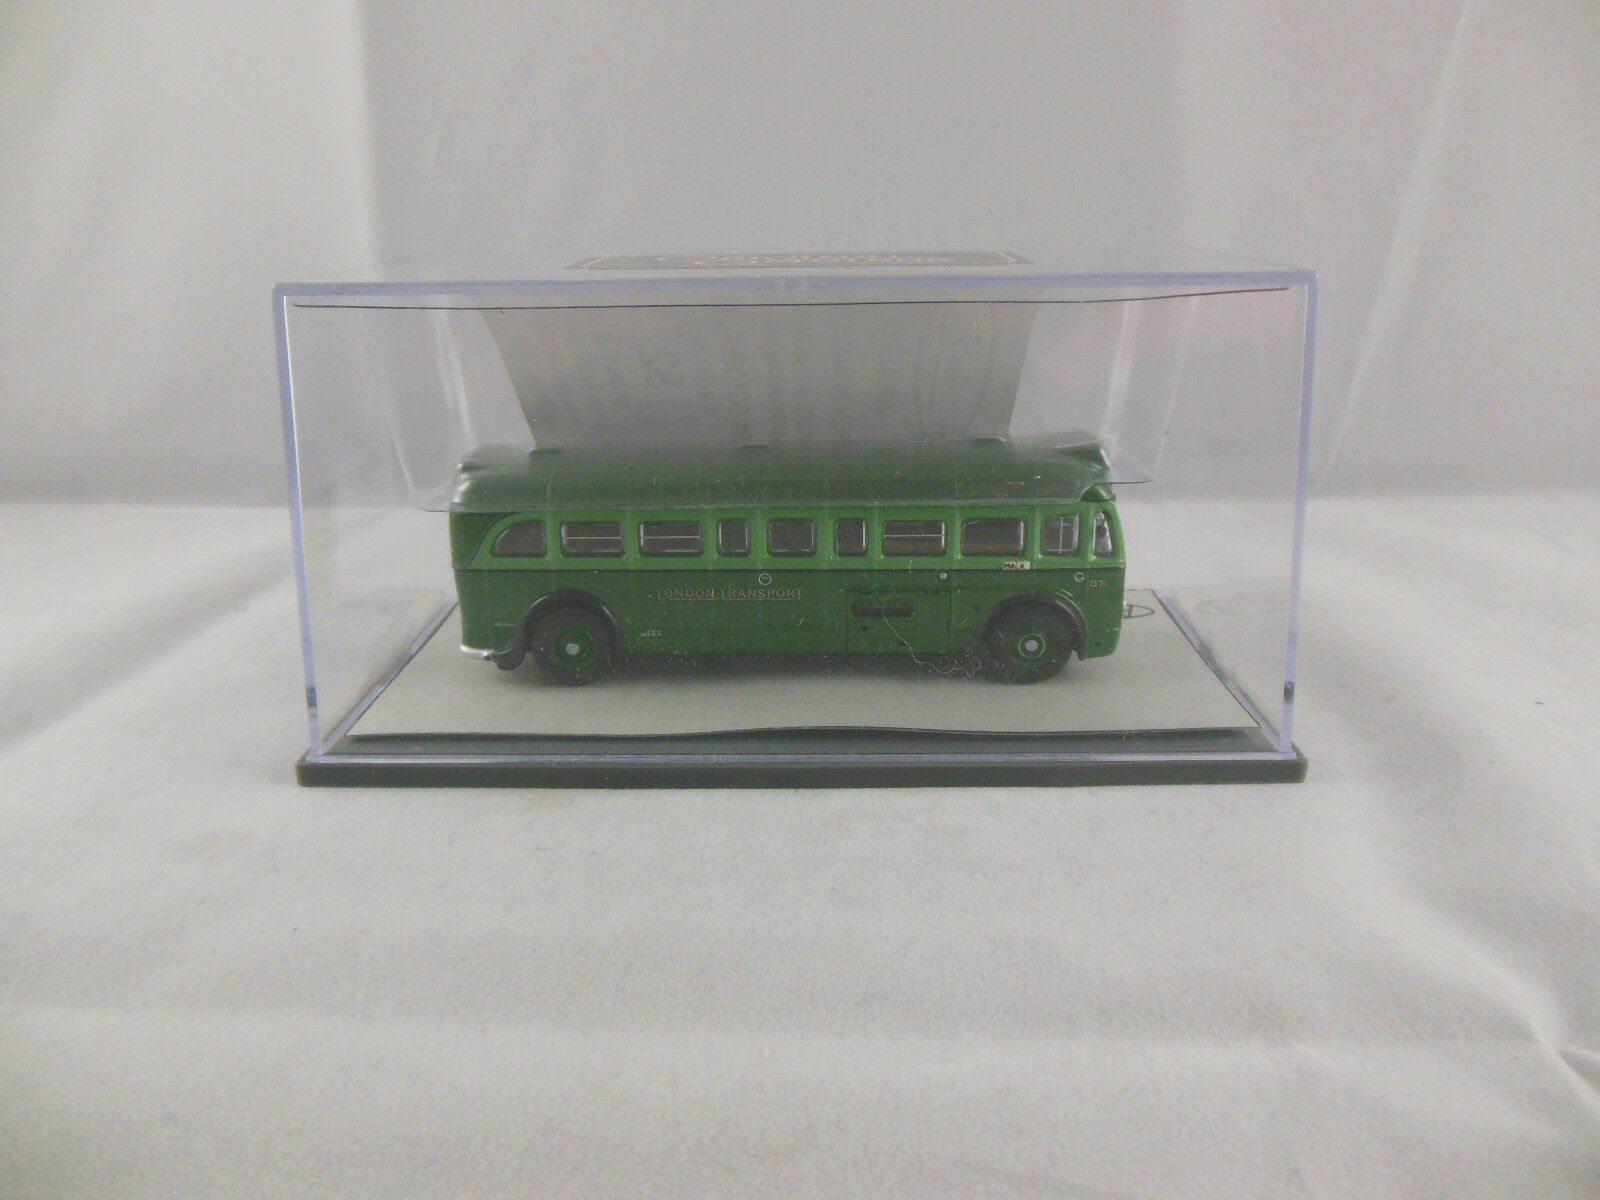 CODICE 3 3 3 RARA Corgi OOC AEC Q un piano Autobus Trasporto Londinese Scala 1 76 Ltd. ed. 05d5c2